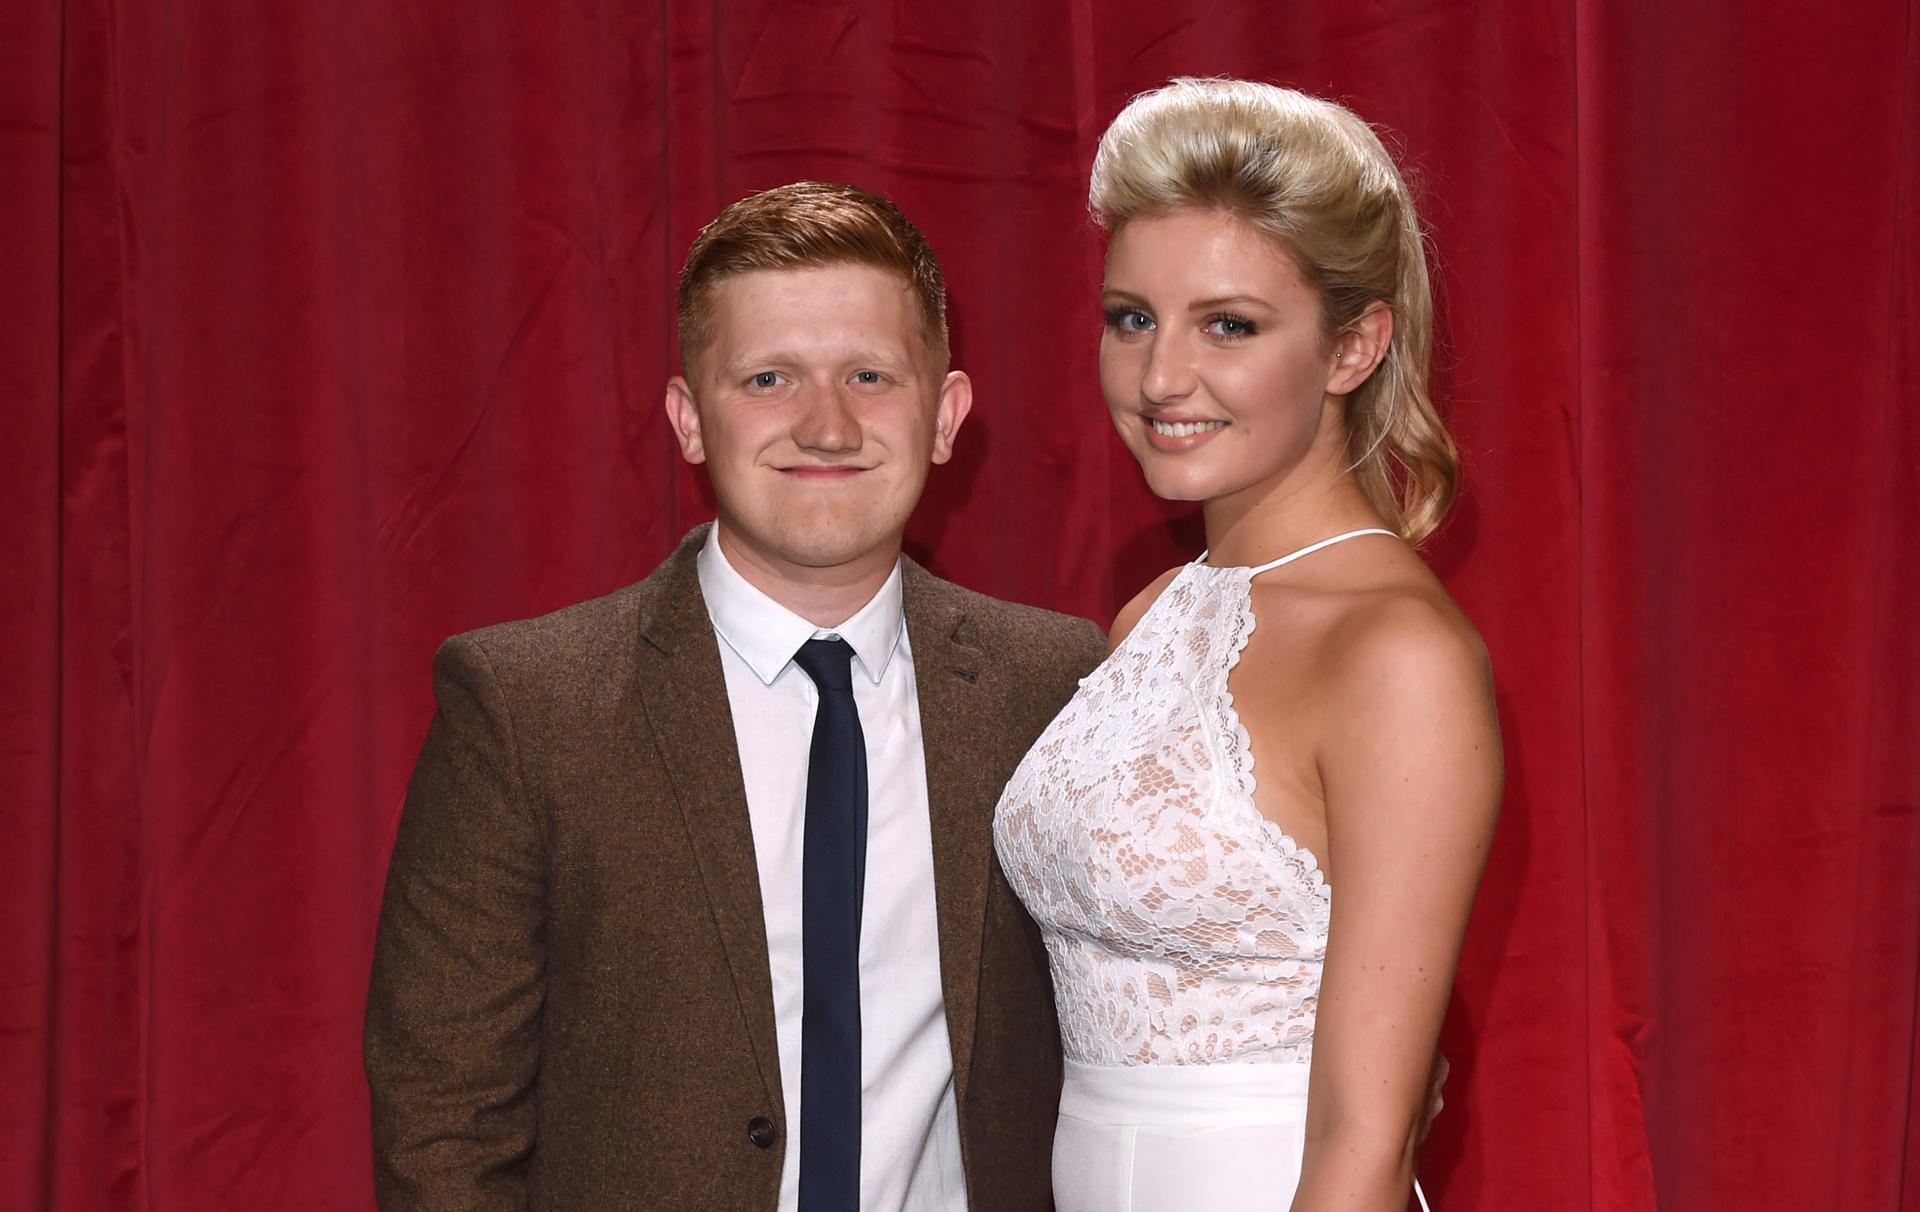 Sam Aston and Briony Gardner